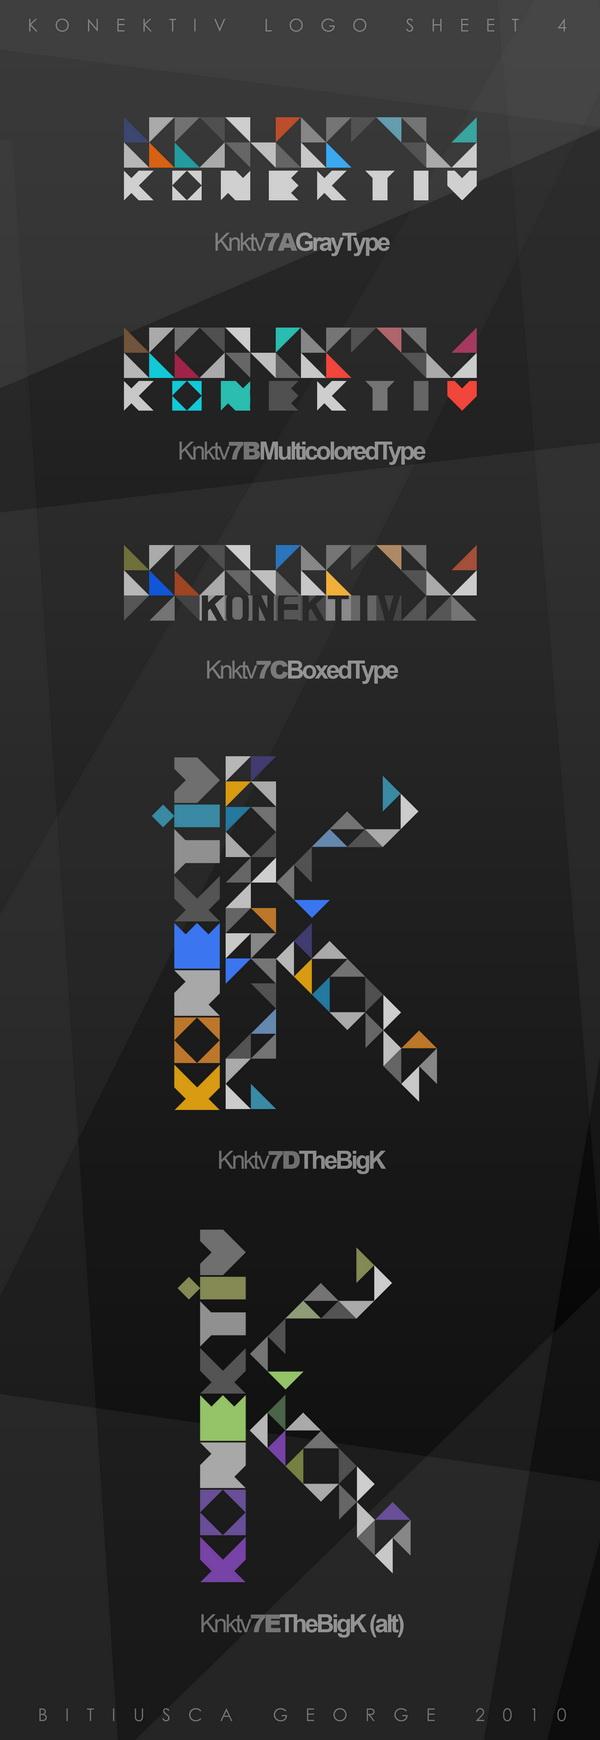 Konektiv - LogoSheet 4 by Horhew